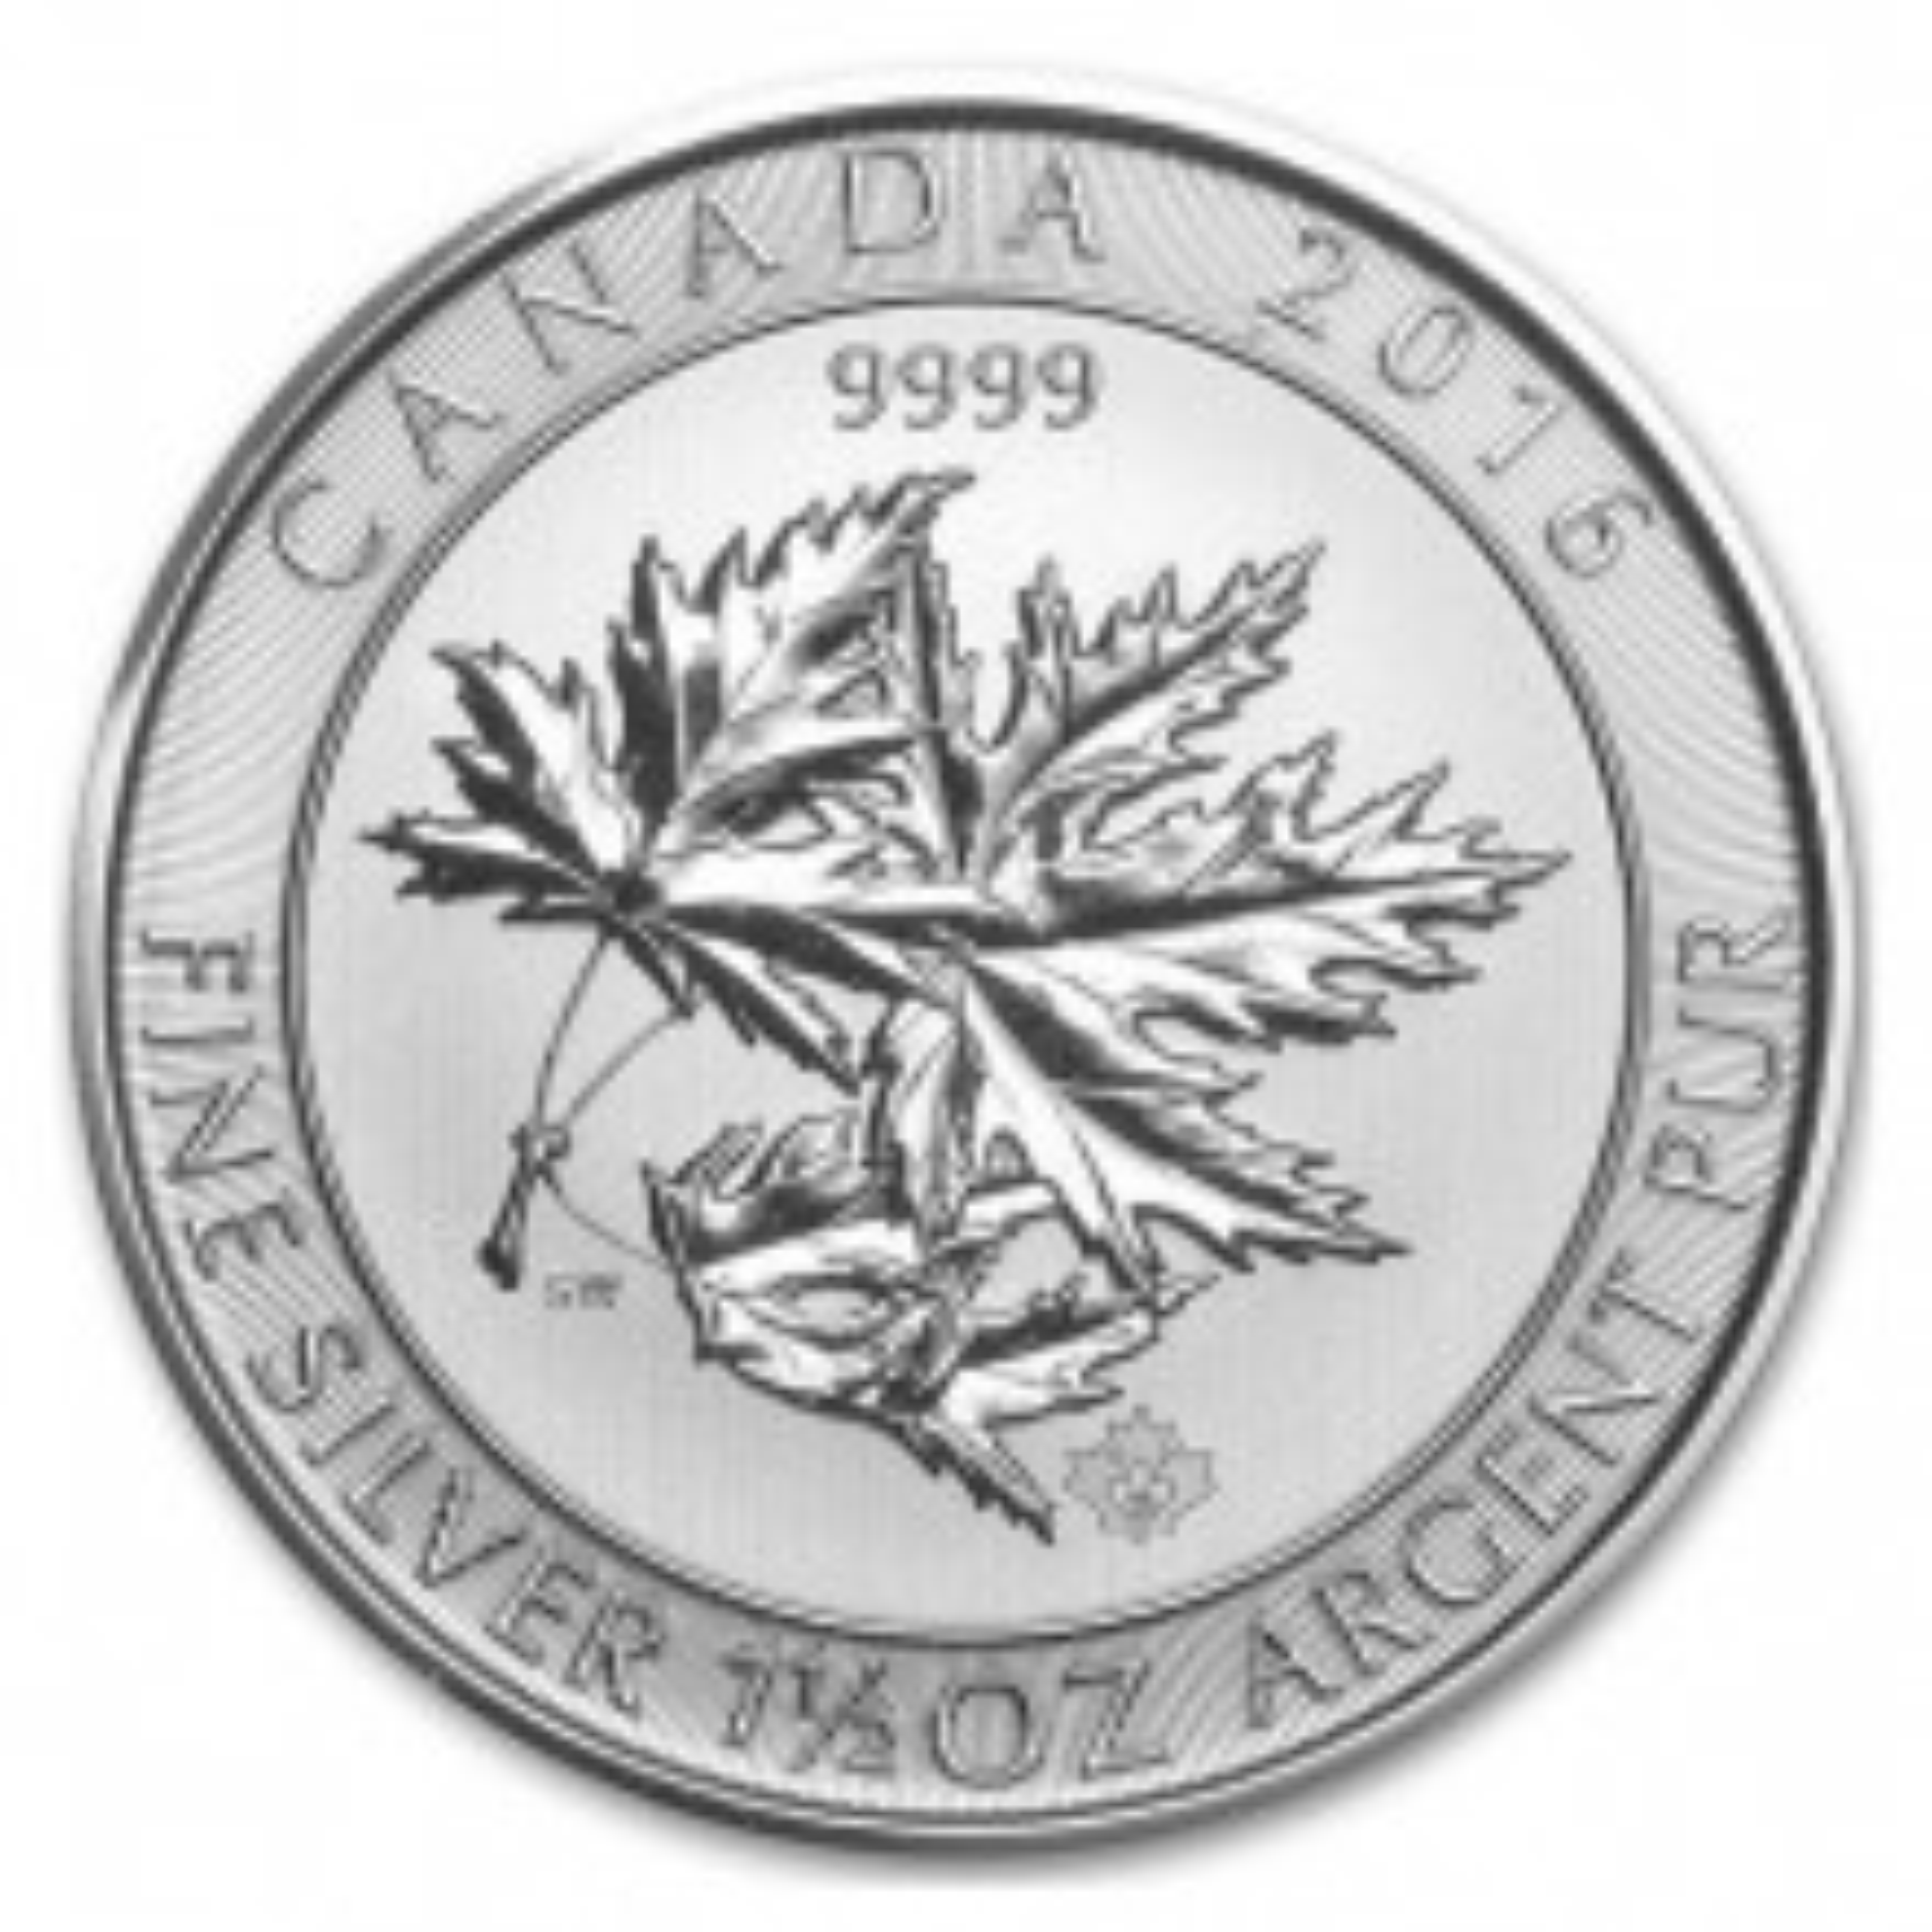 1.5 troy ounce silver Multi Maple Leaf coin 2016